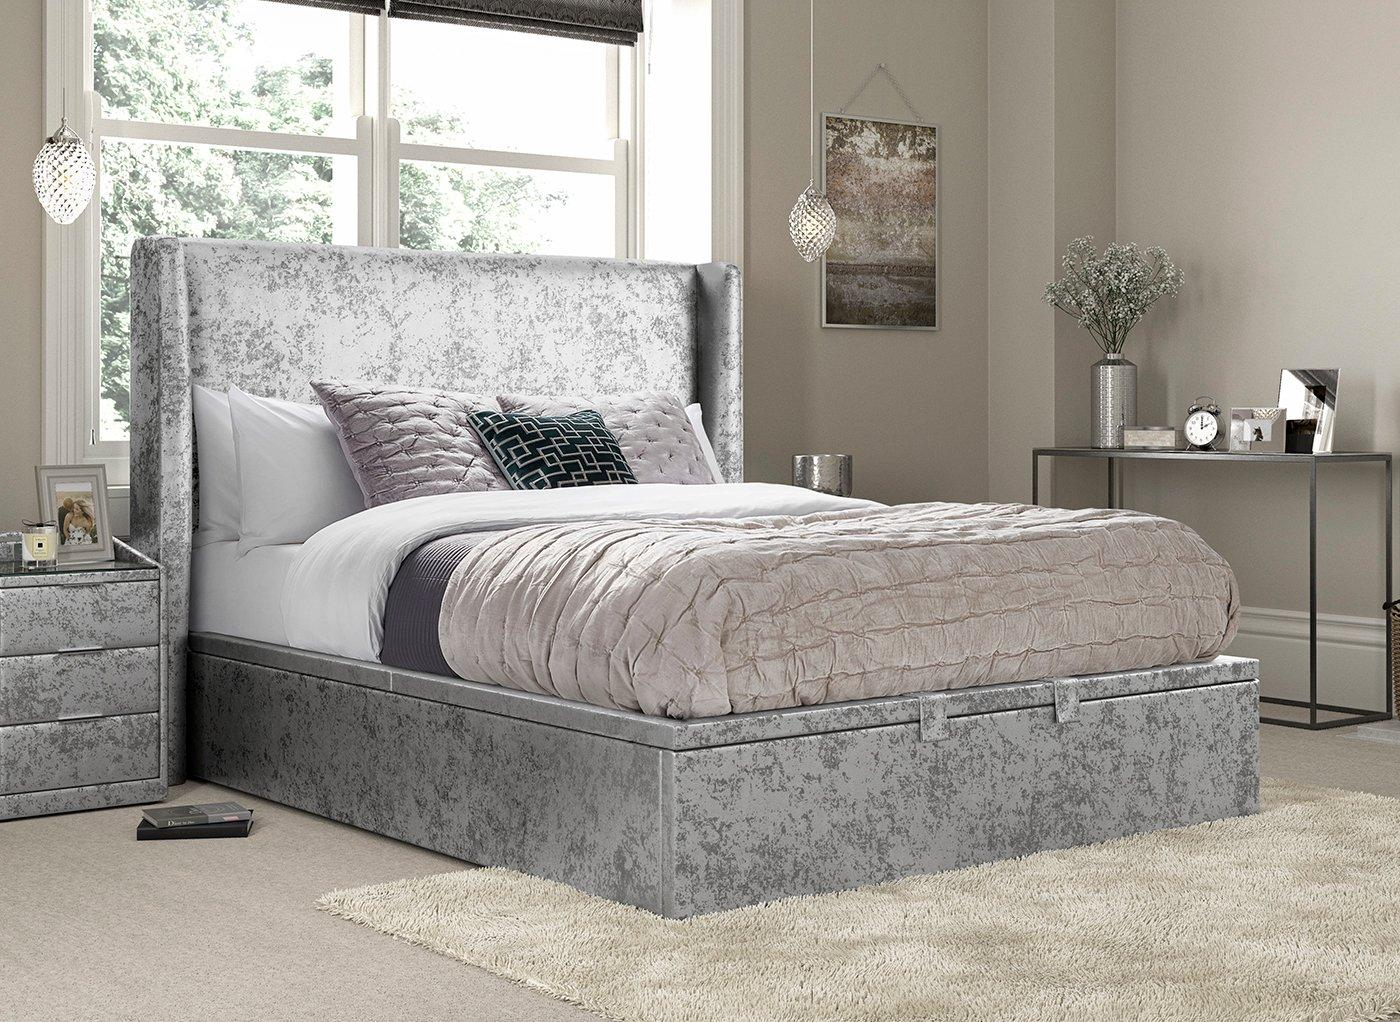 Parmer Upholstered Ottoman Bed Frame (£899)